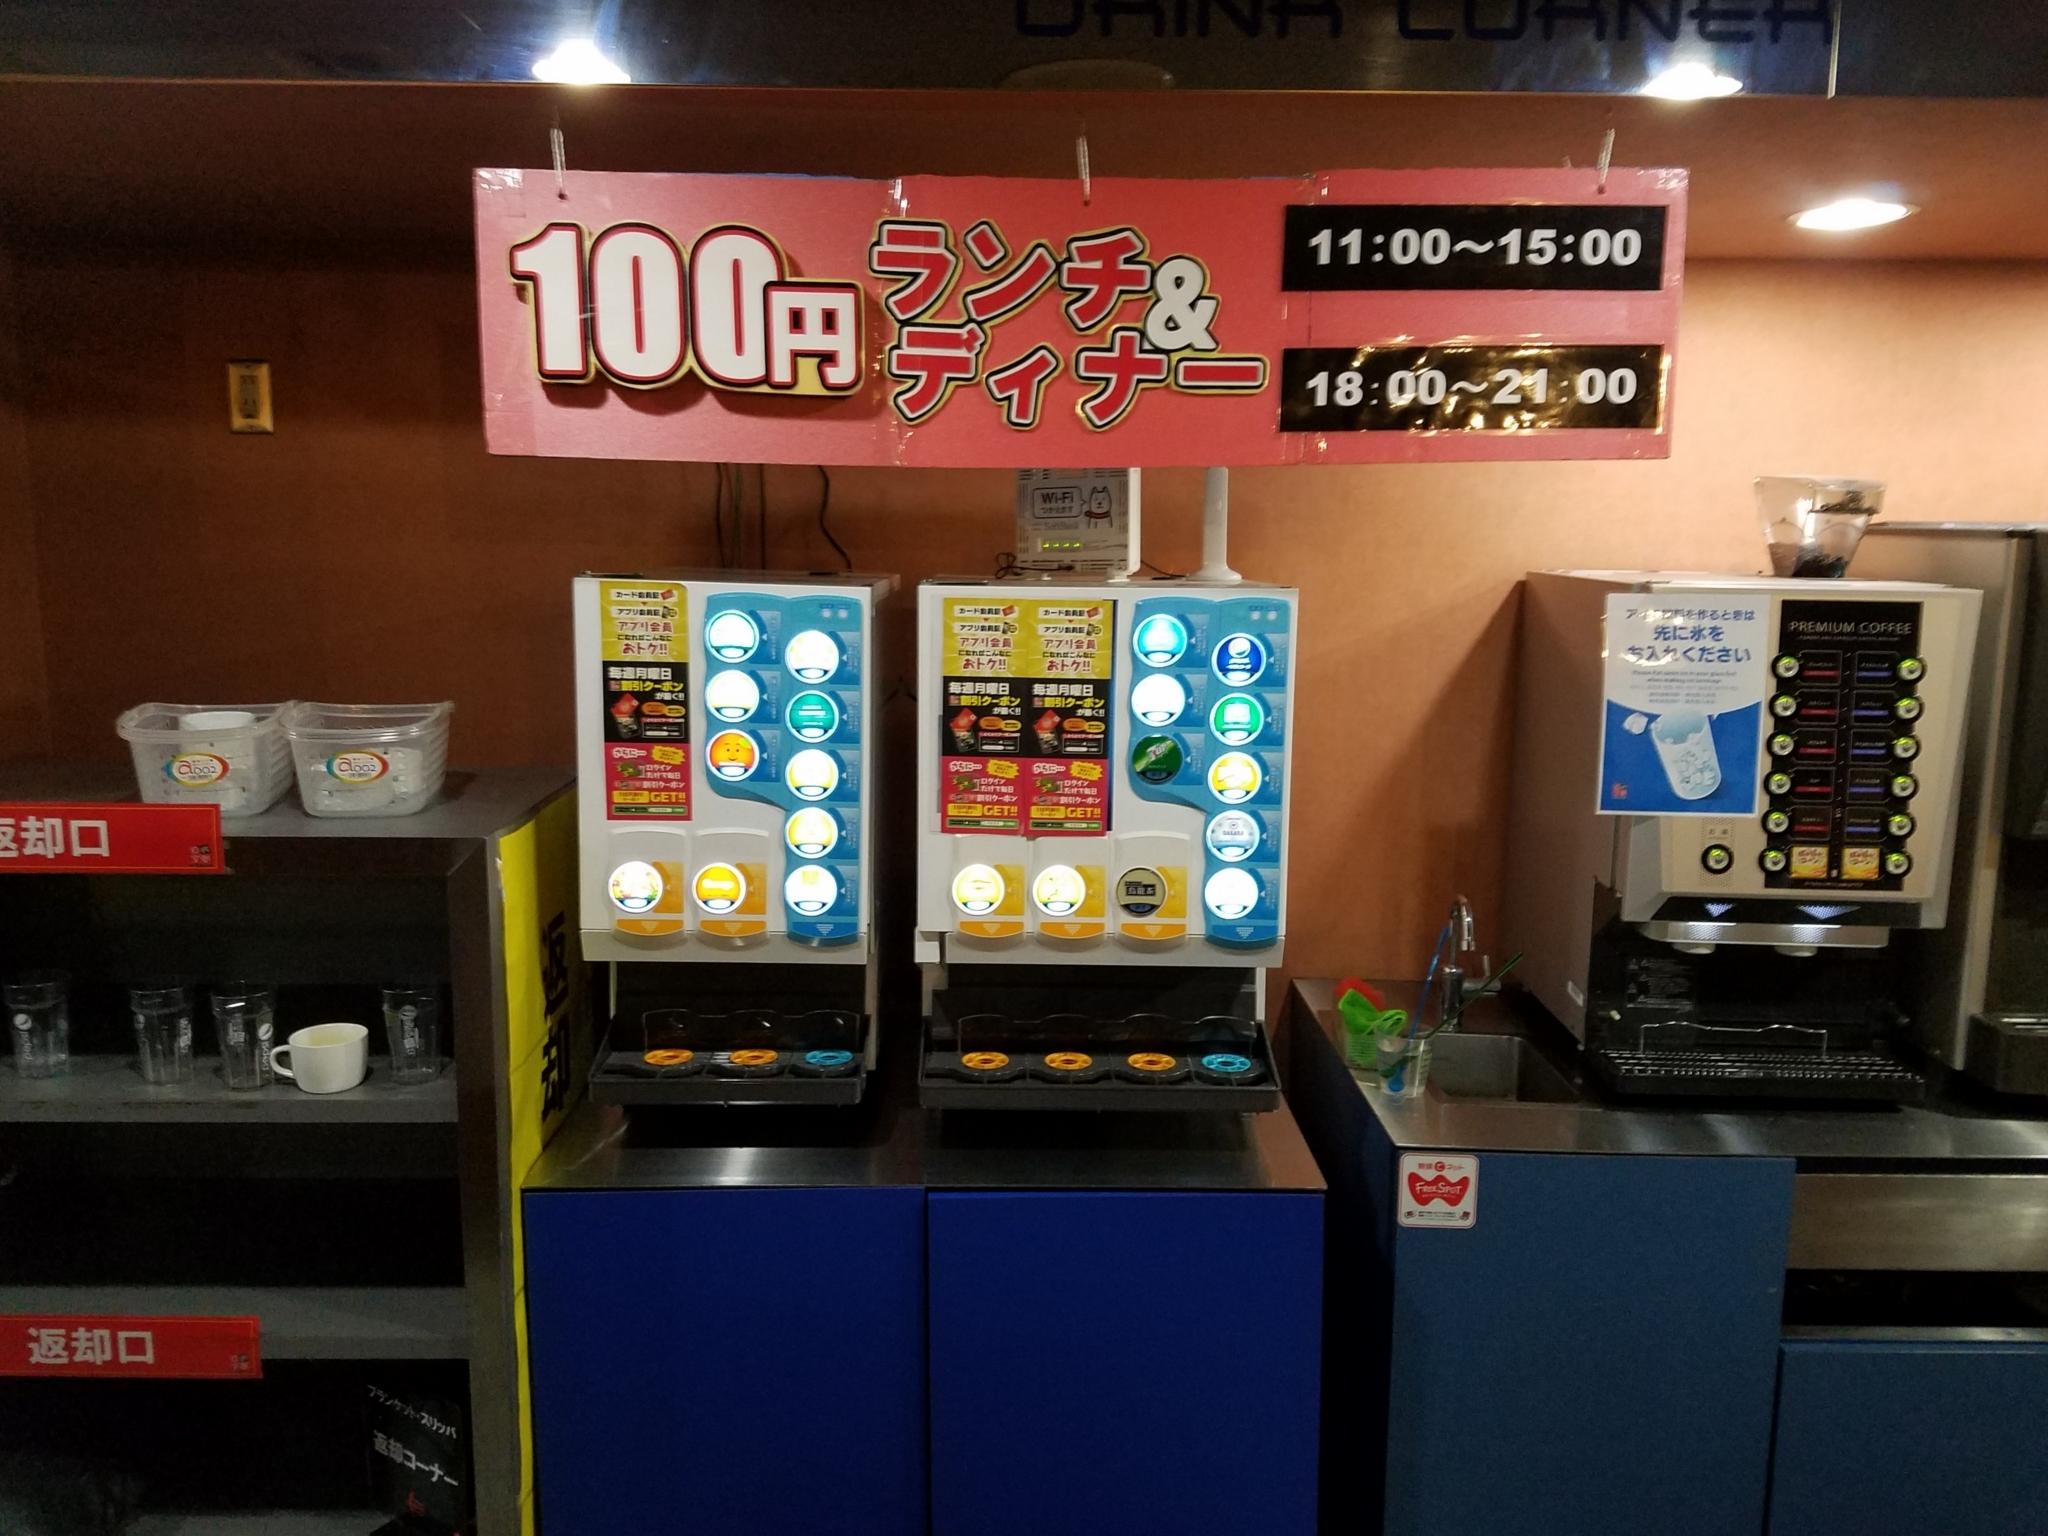 f:id:ToshUeno:20170503055741j:plain